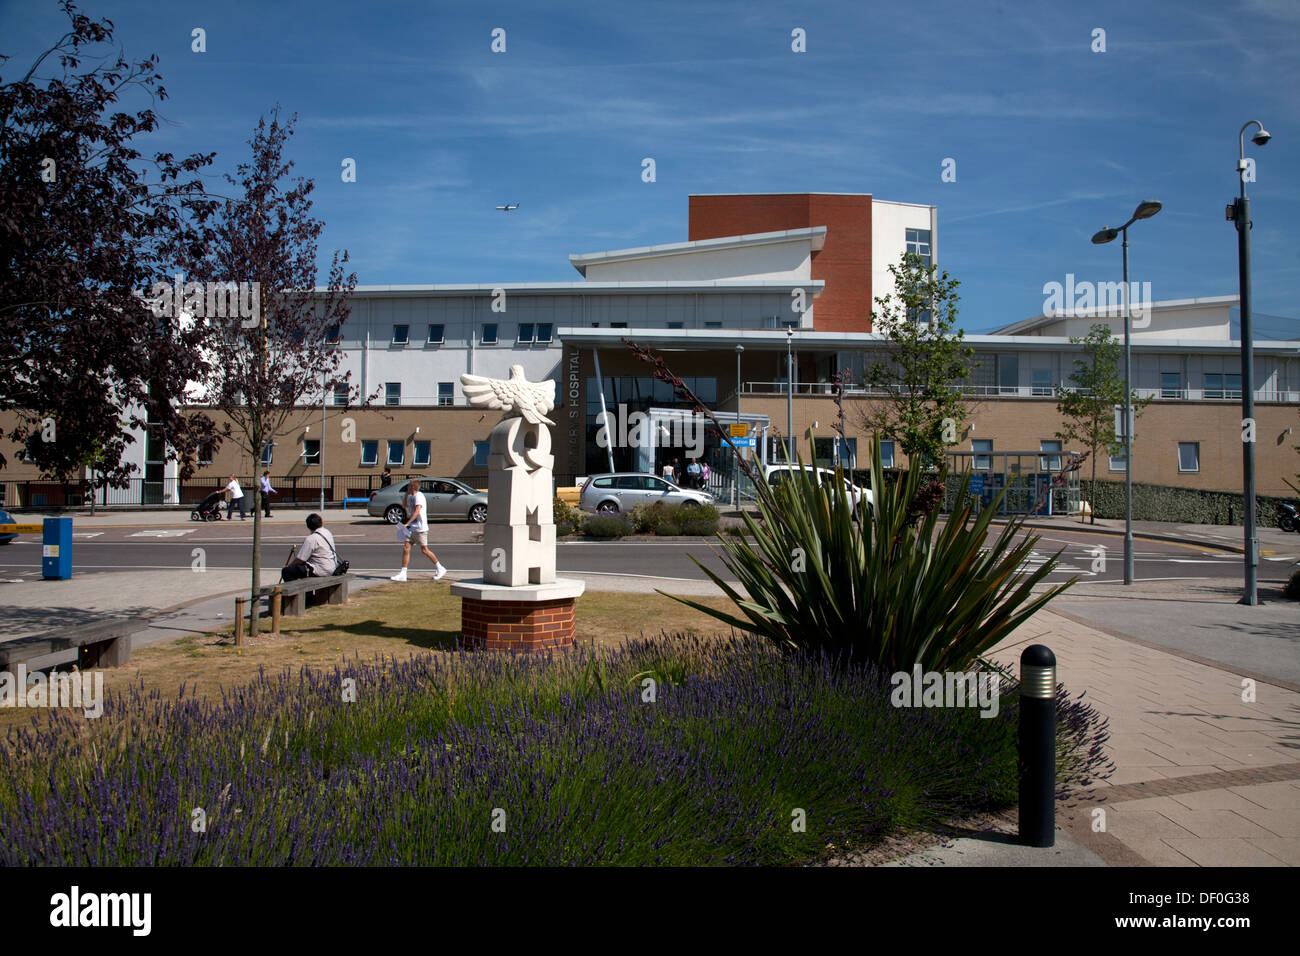 L'hôpital Queen Mary de Londres Angleterre Roehampton Photo Stock